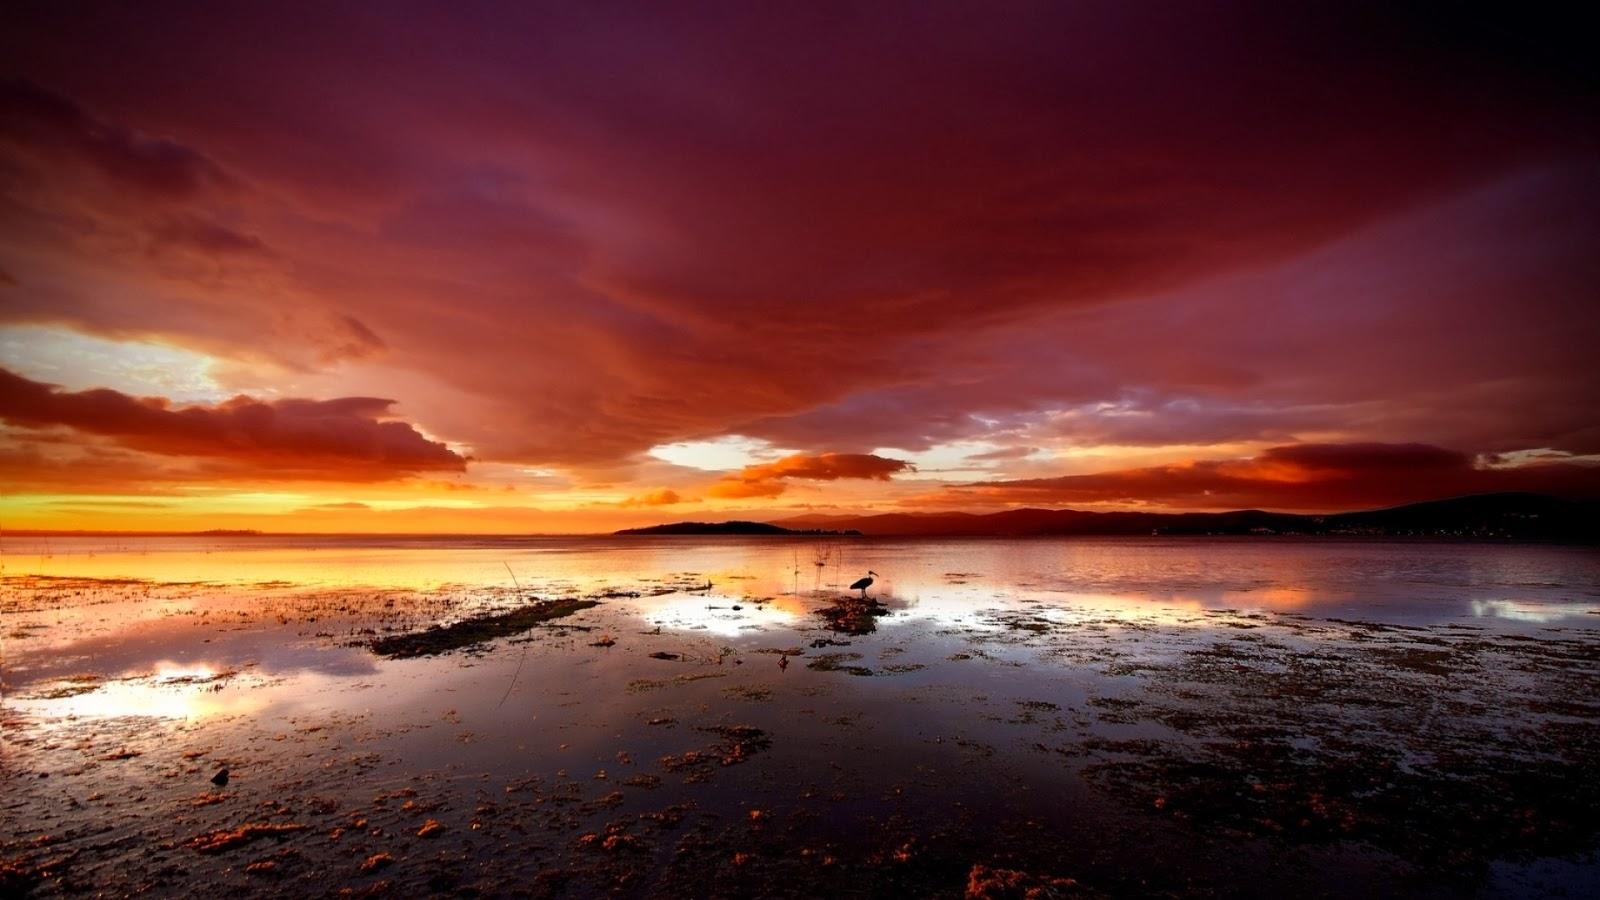 Cielo rojo Swampland & Ave